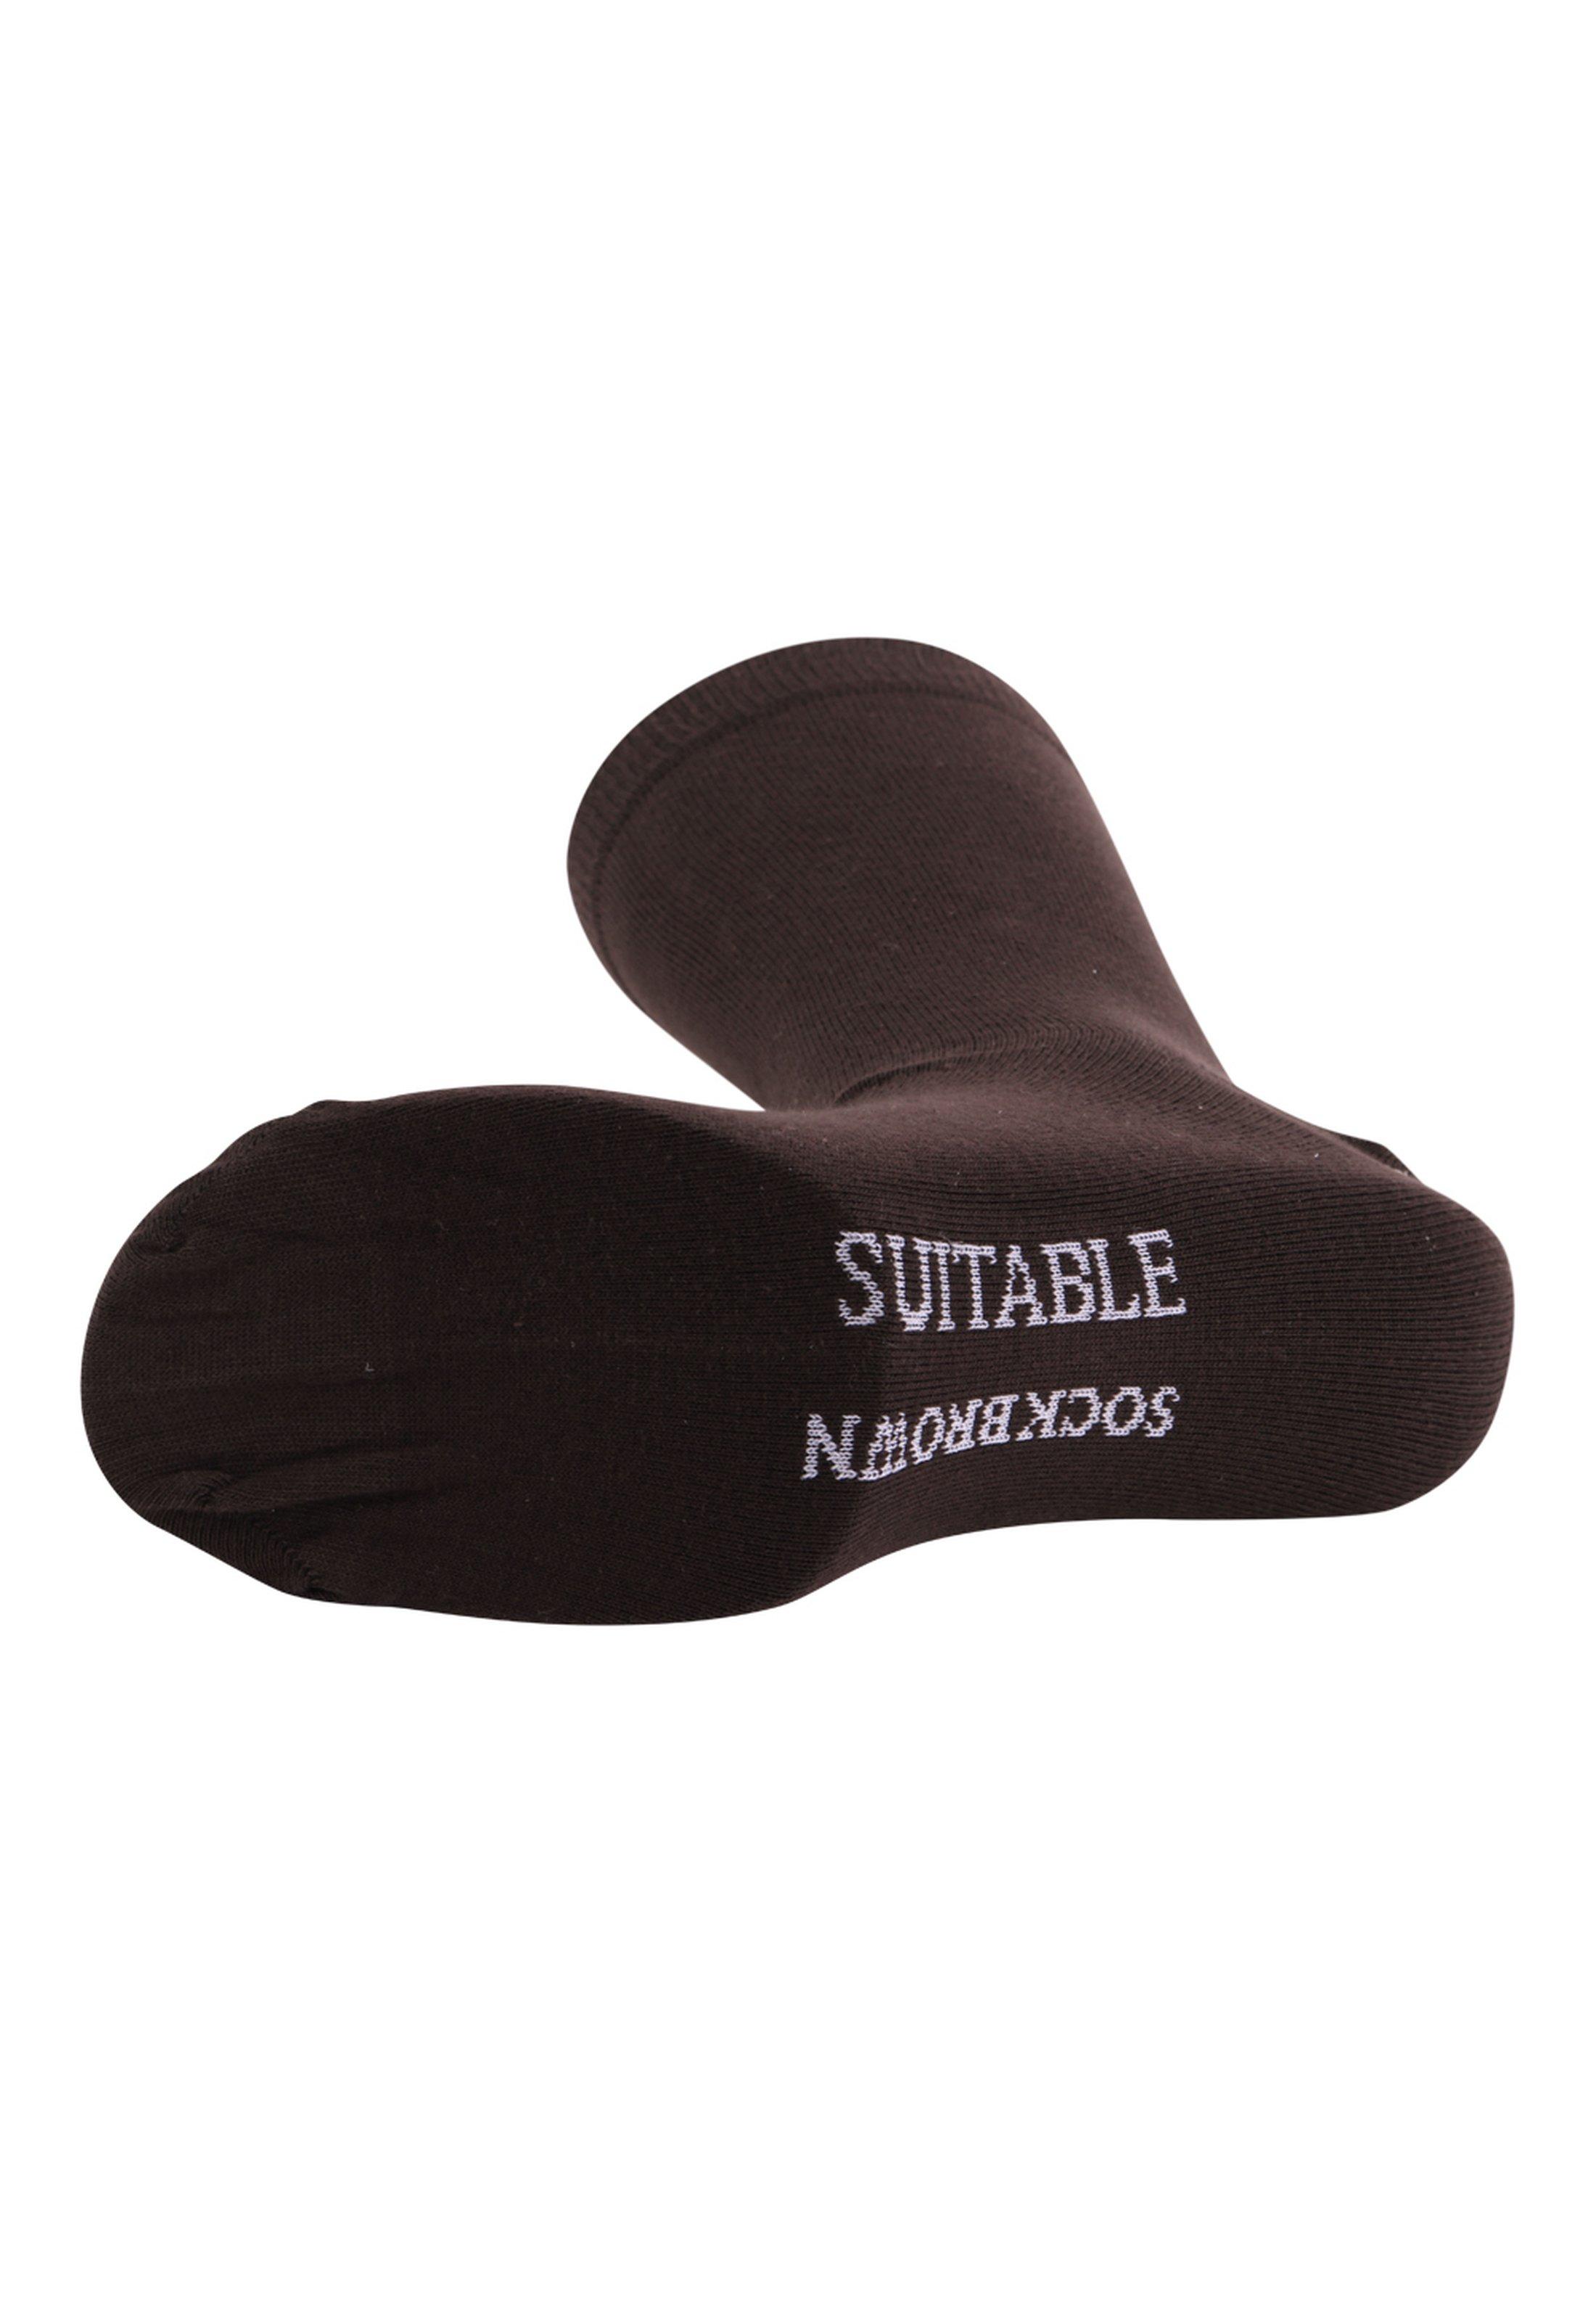 Suitable Socken Braun foto 1